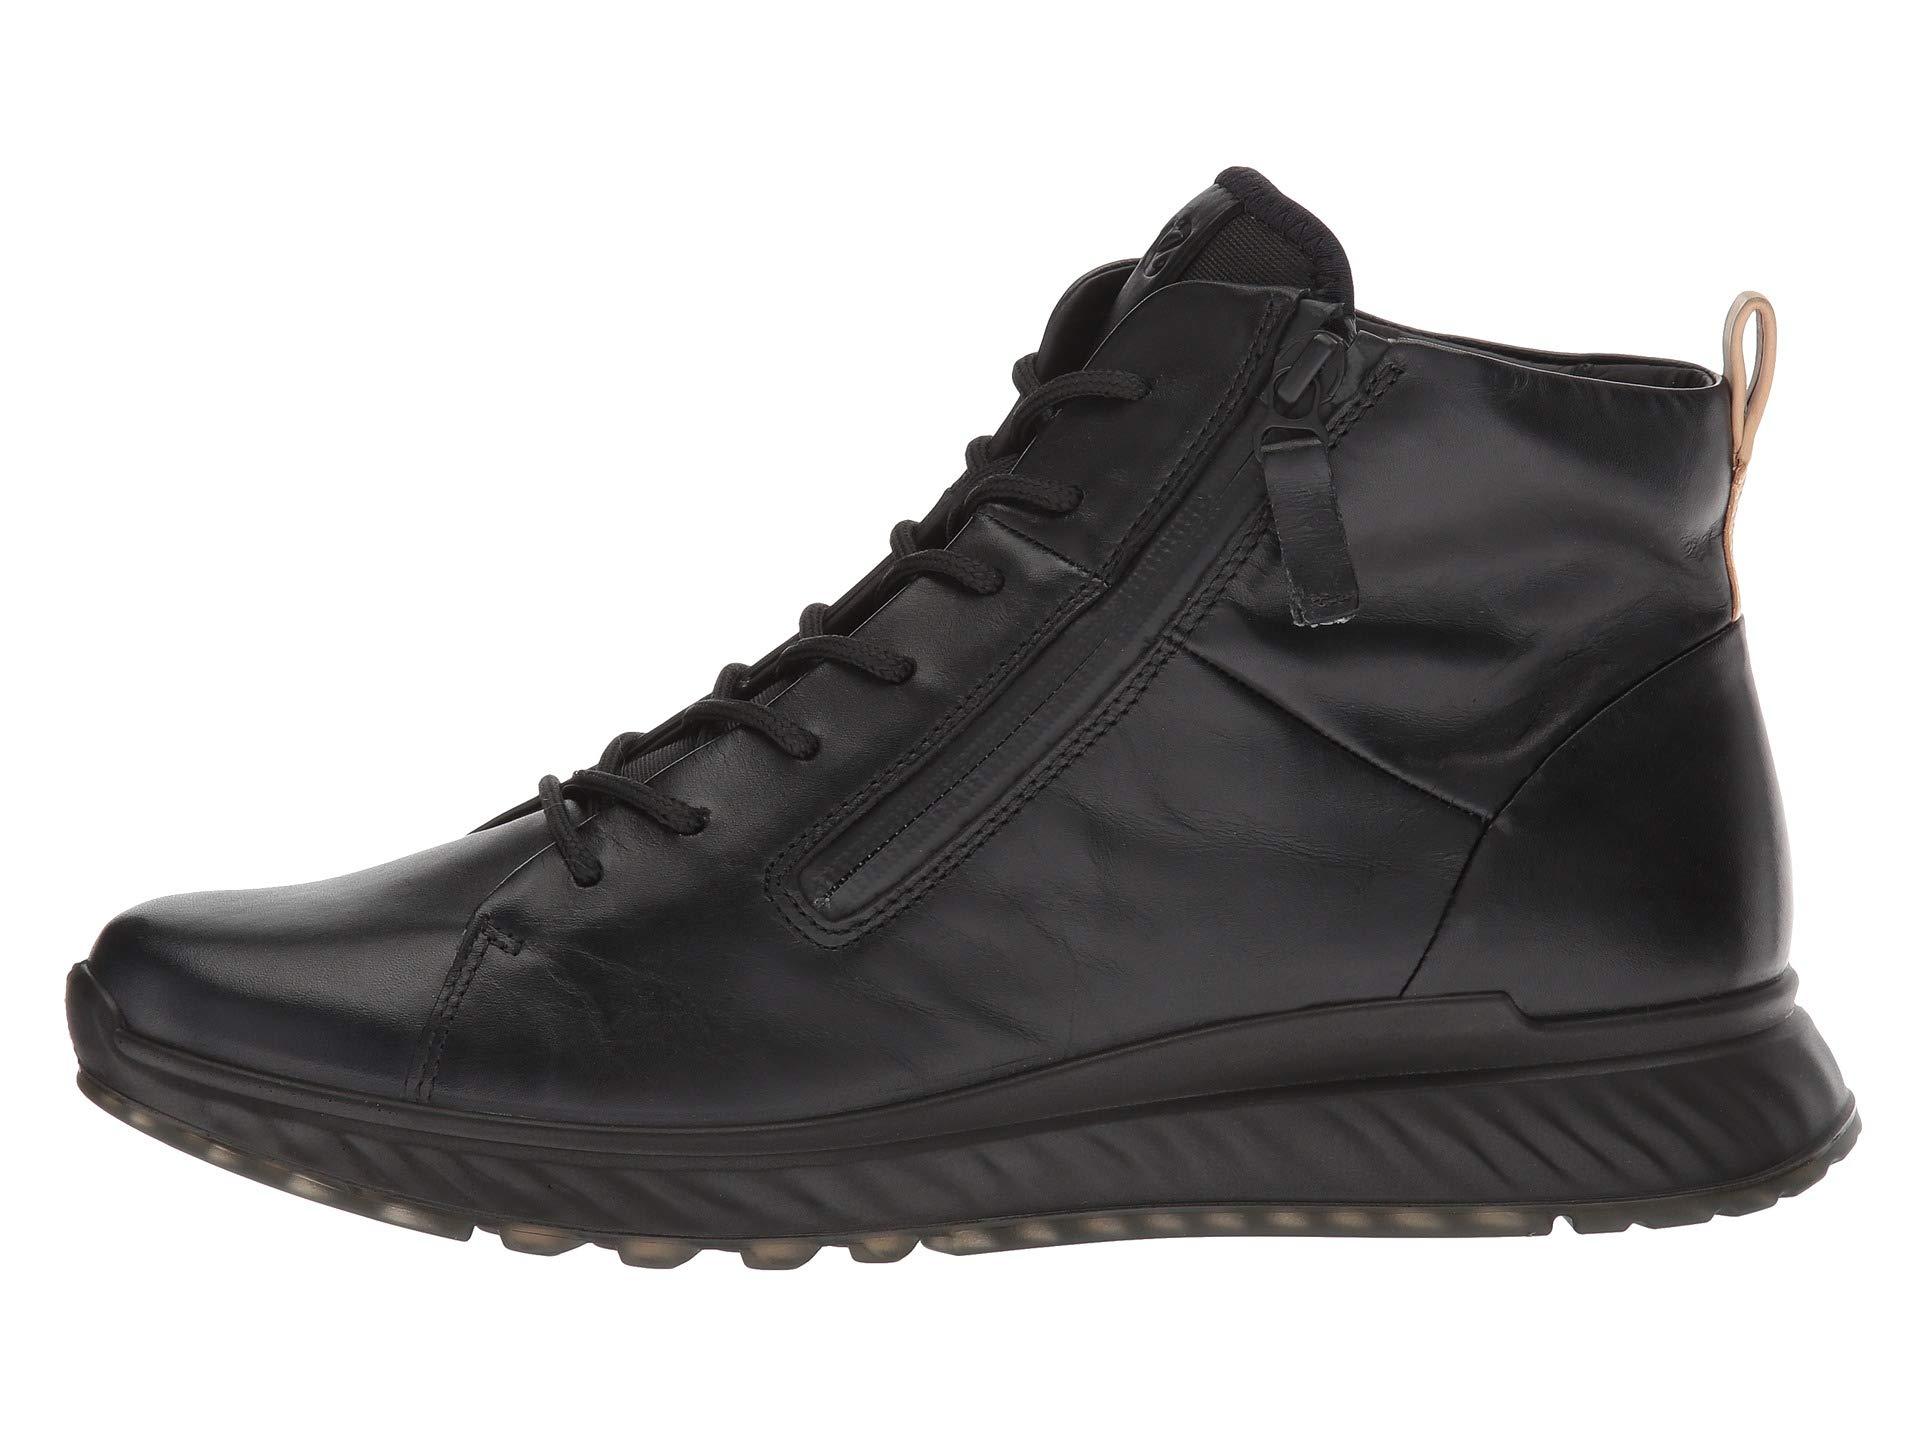 High Top Leather Calf Ecco St1 Black 8xq5wq0F